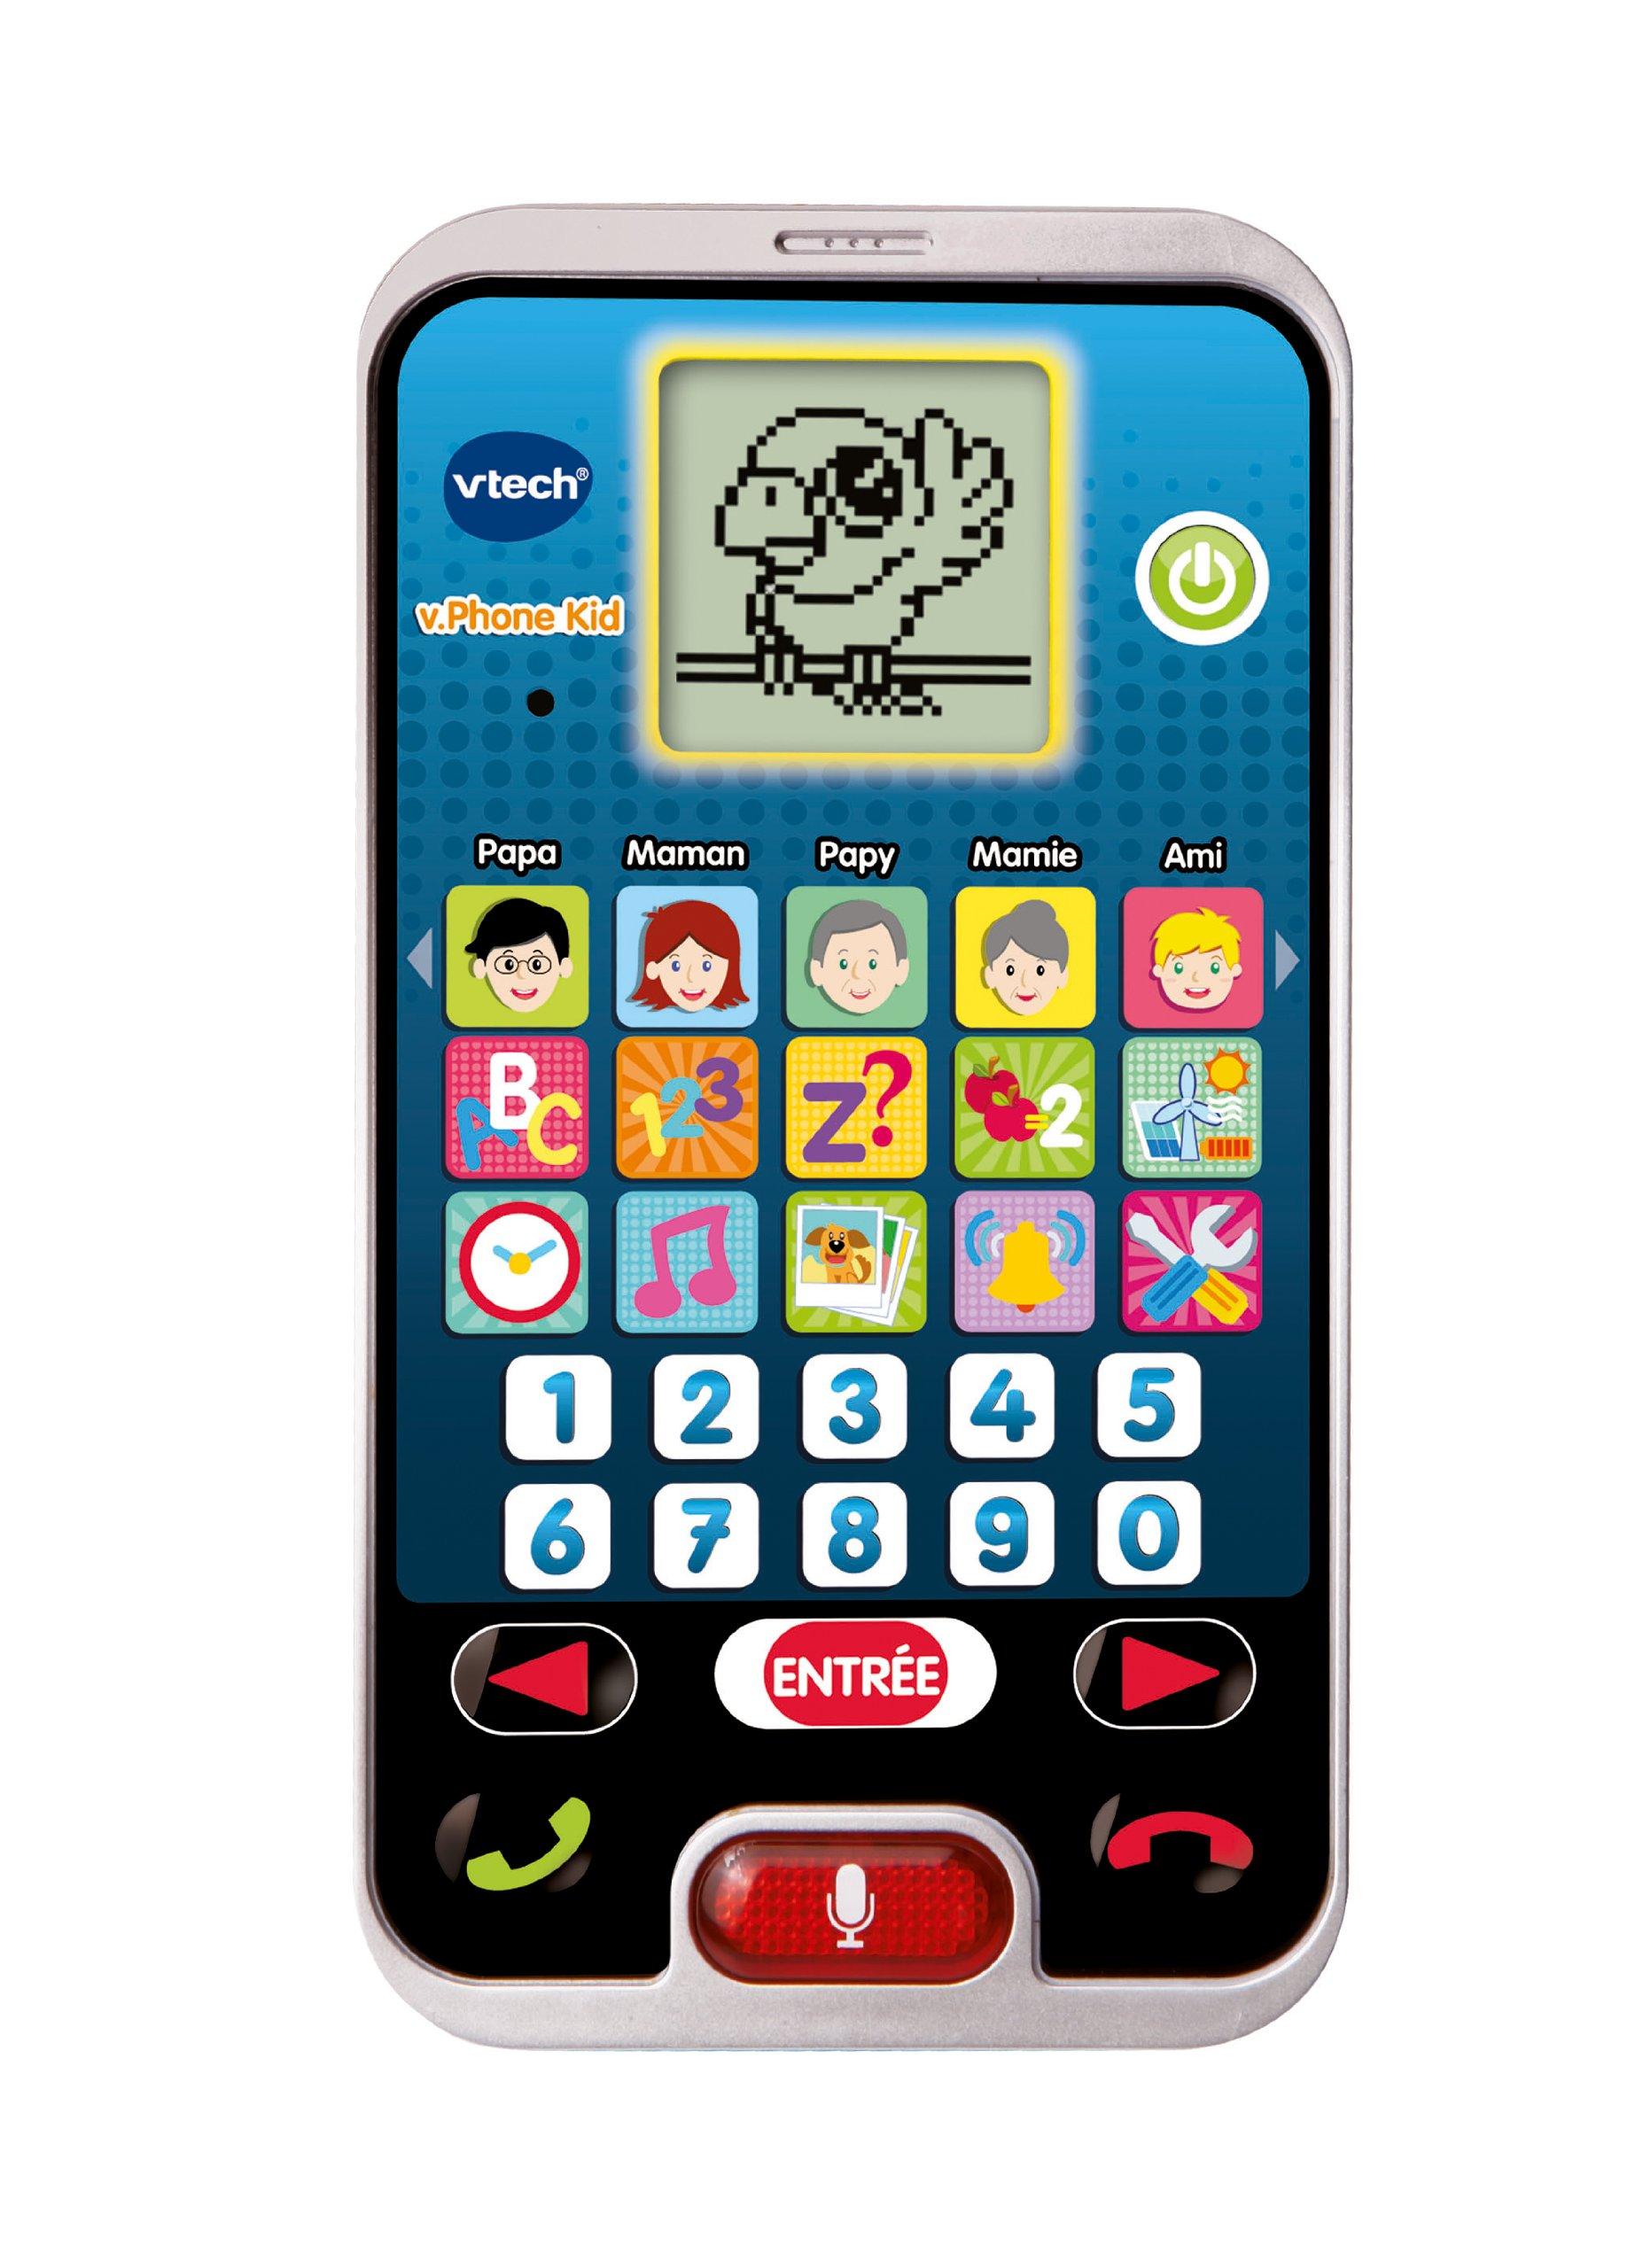 VTech Smartphone V Phone Kid, 139305 product image